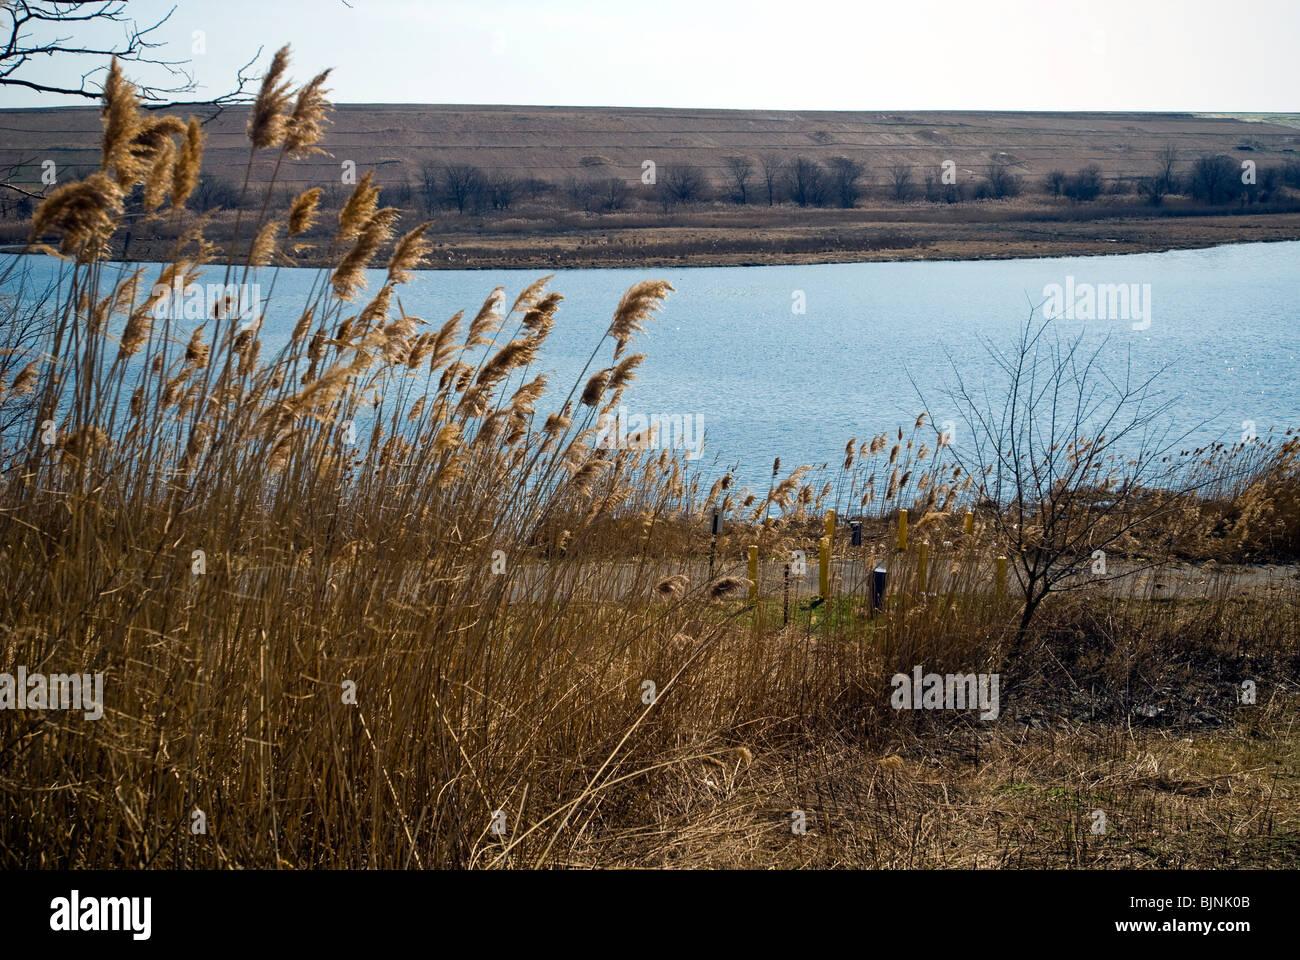 East Mound is seen across Fresh Kills in the Fresh Kills landfill in Staten Island in New York - Stock Image